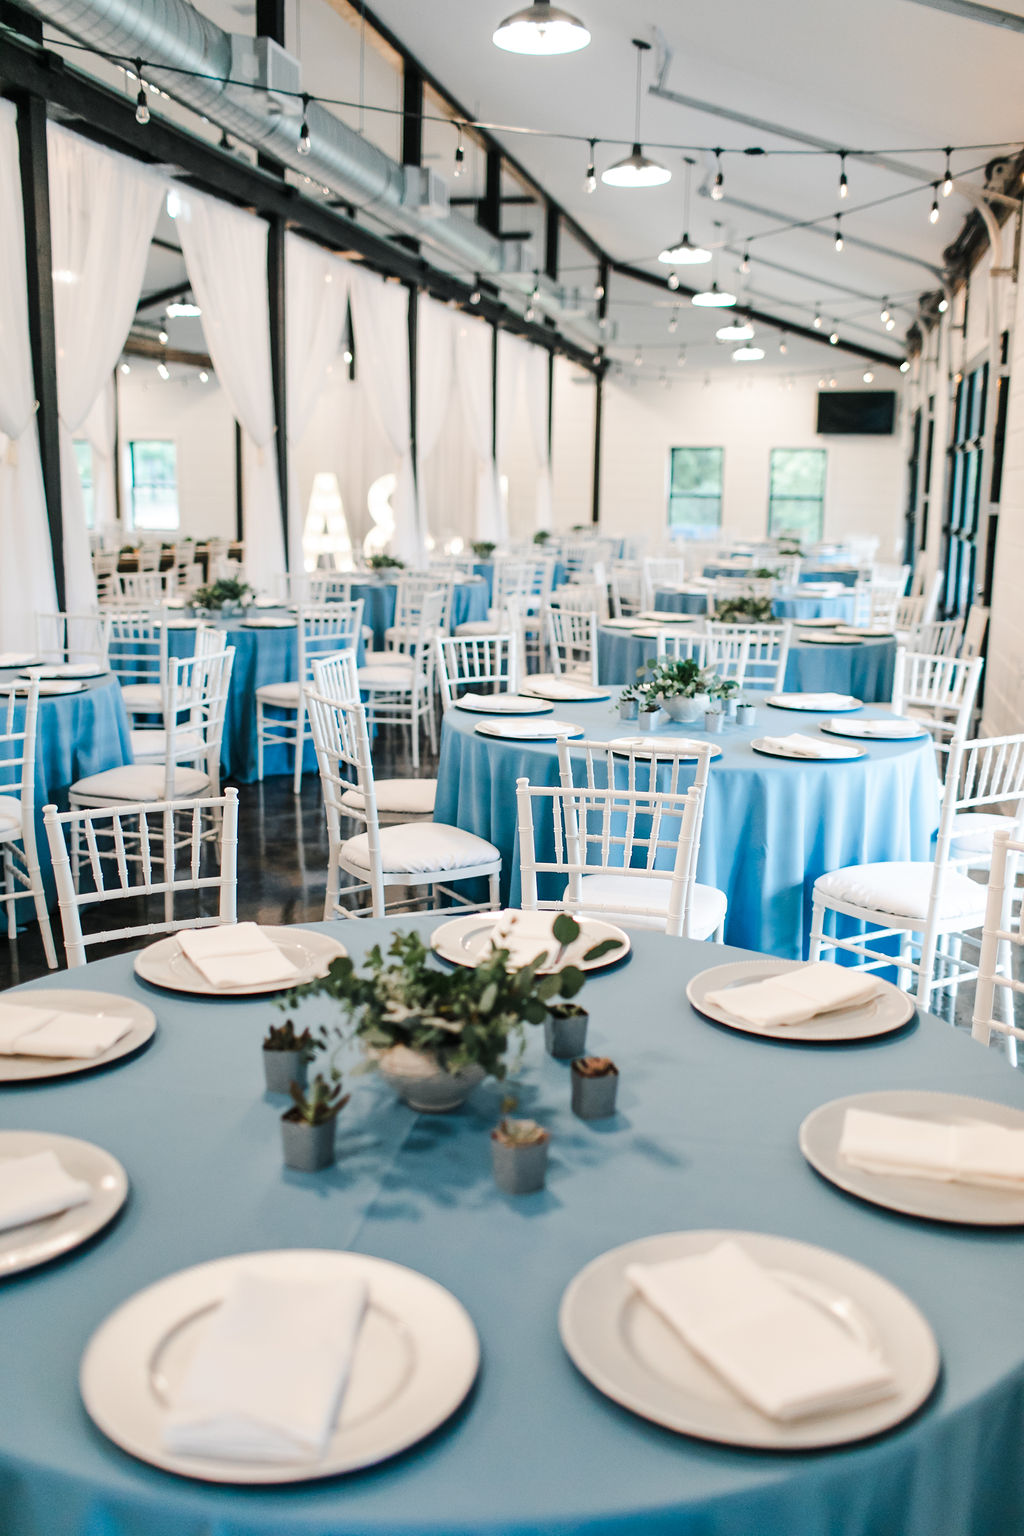 Dream Point Ranch Tulsa's White Barn Wedding Venue 16.jpg